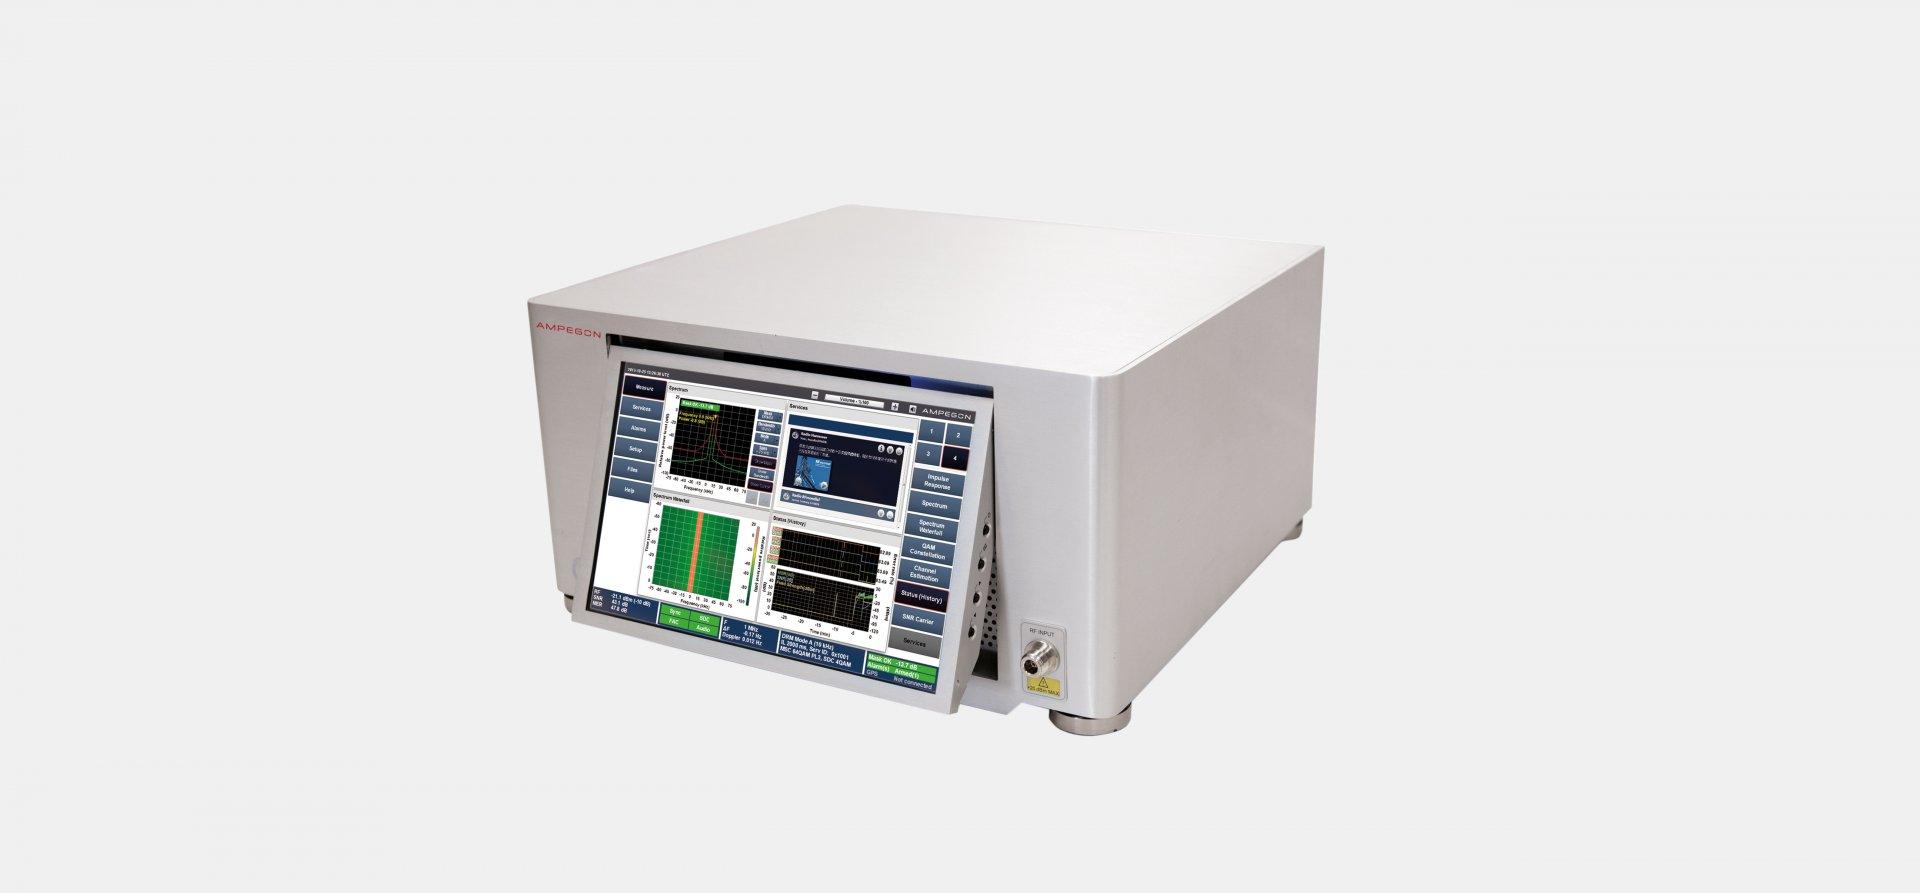 RF-SE DRM Monitoring Receiver